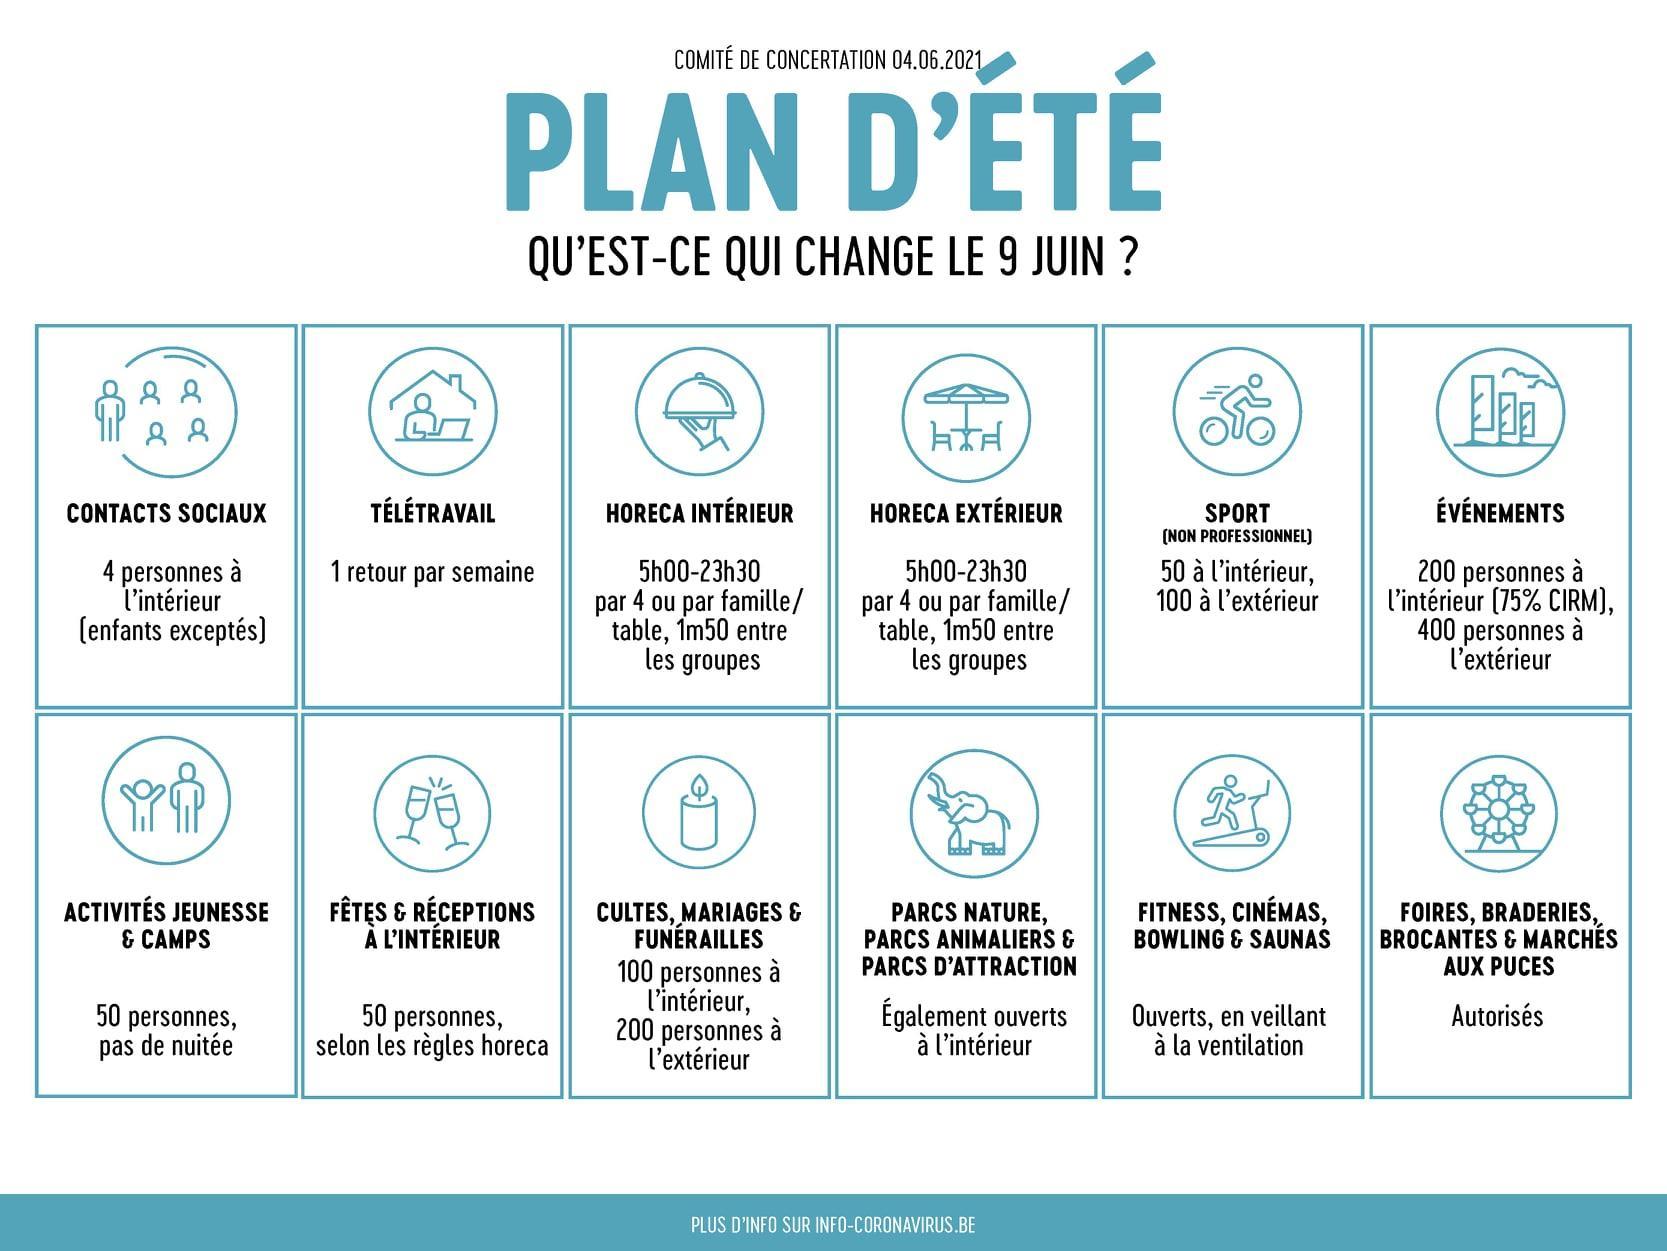 20210604 zomerplan fr